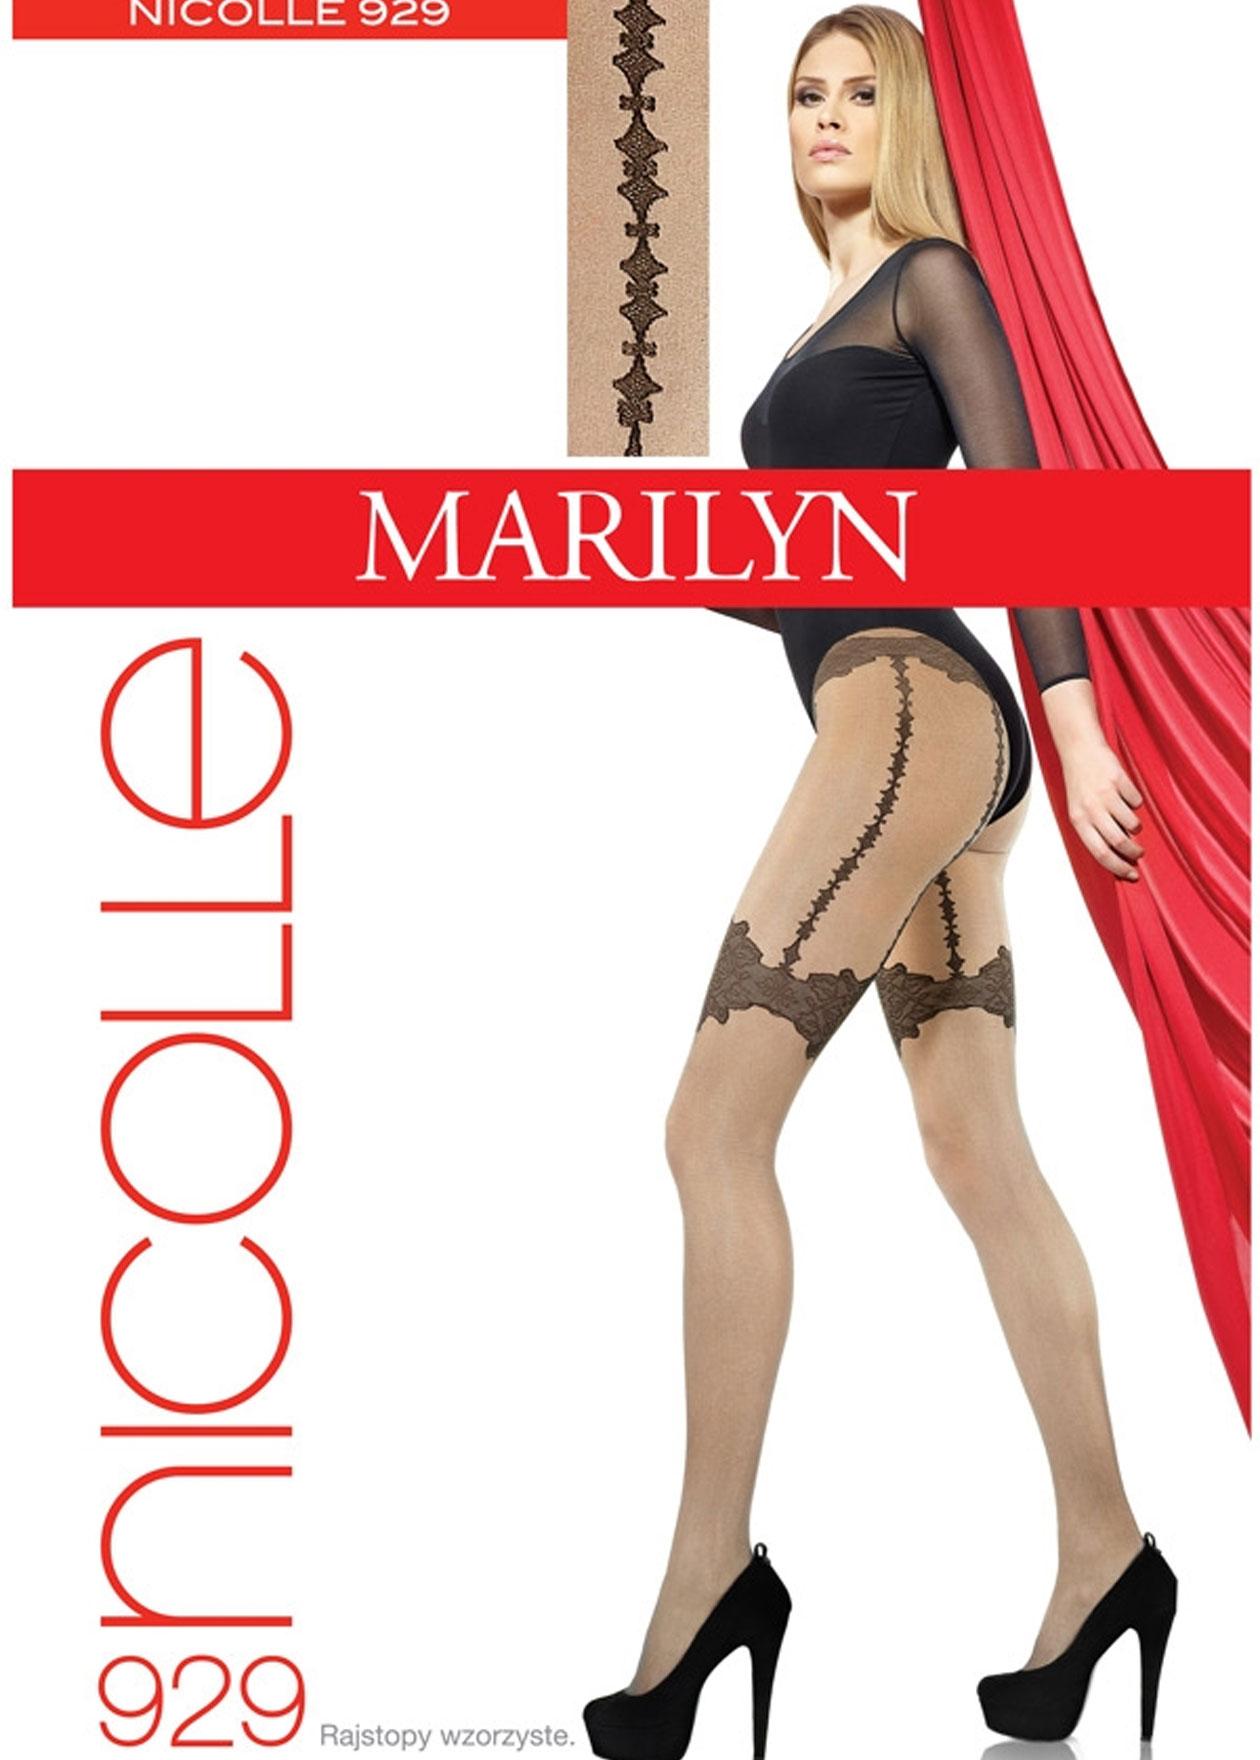 Marilyn Nicolle 929